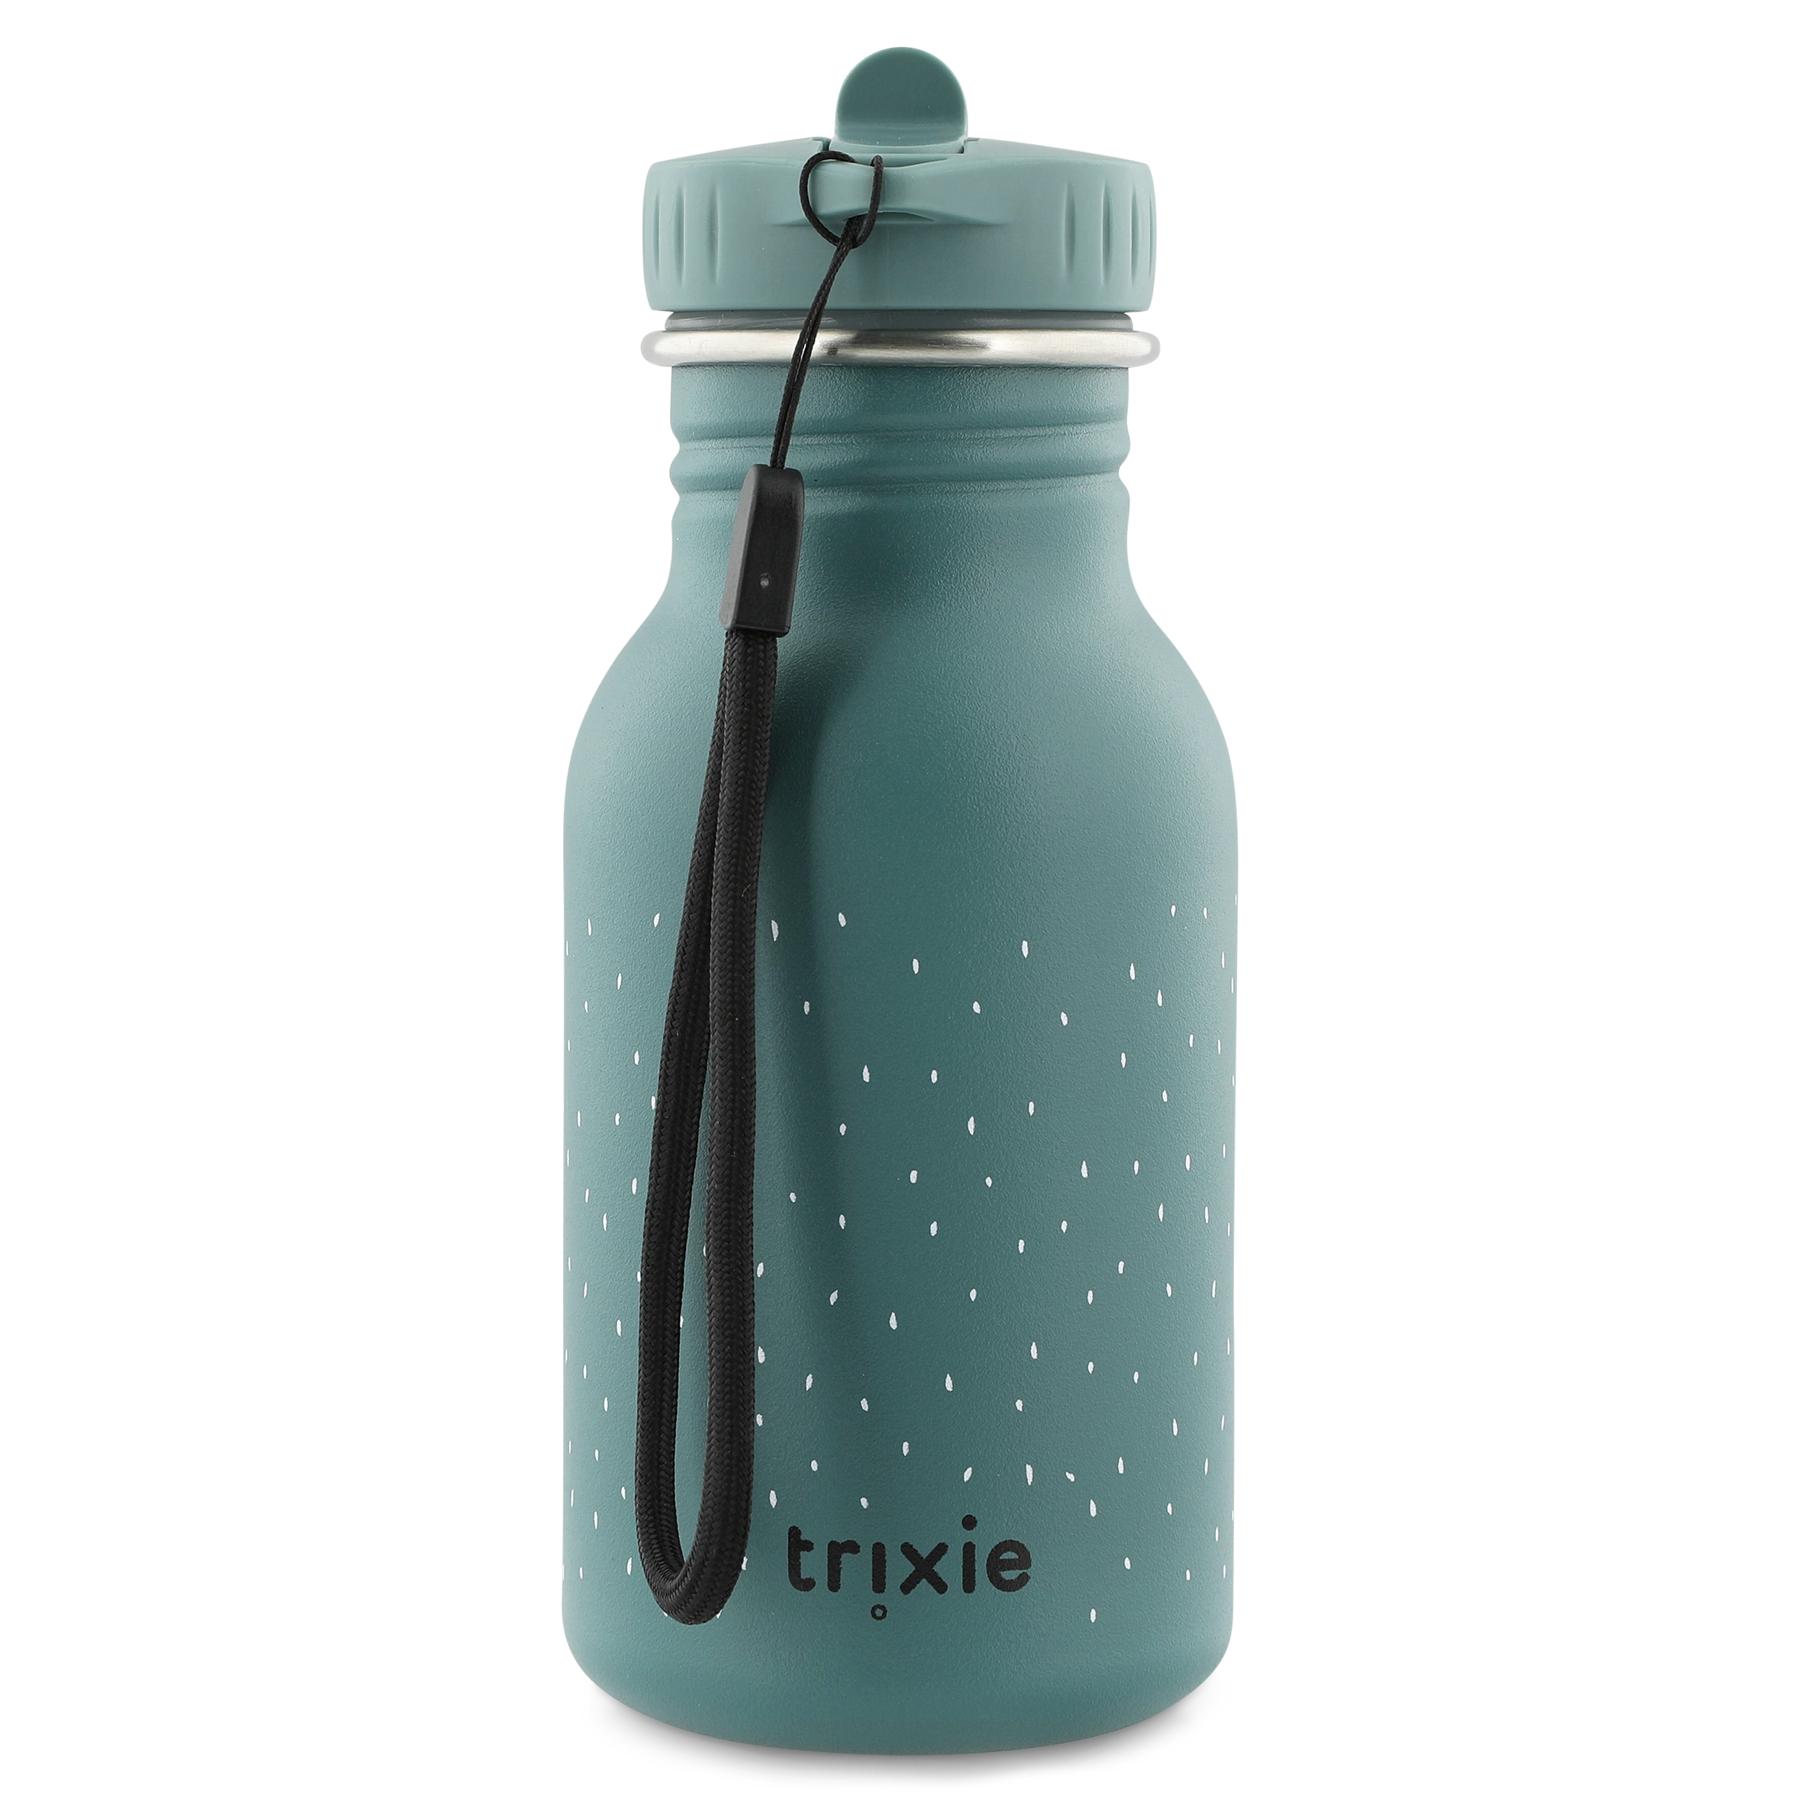 Afbeelding Trixie drinkfles 350ml I Mr Hippo